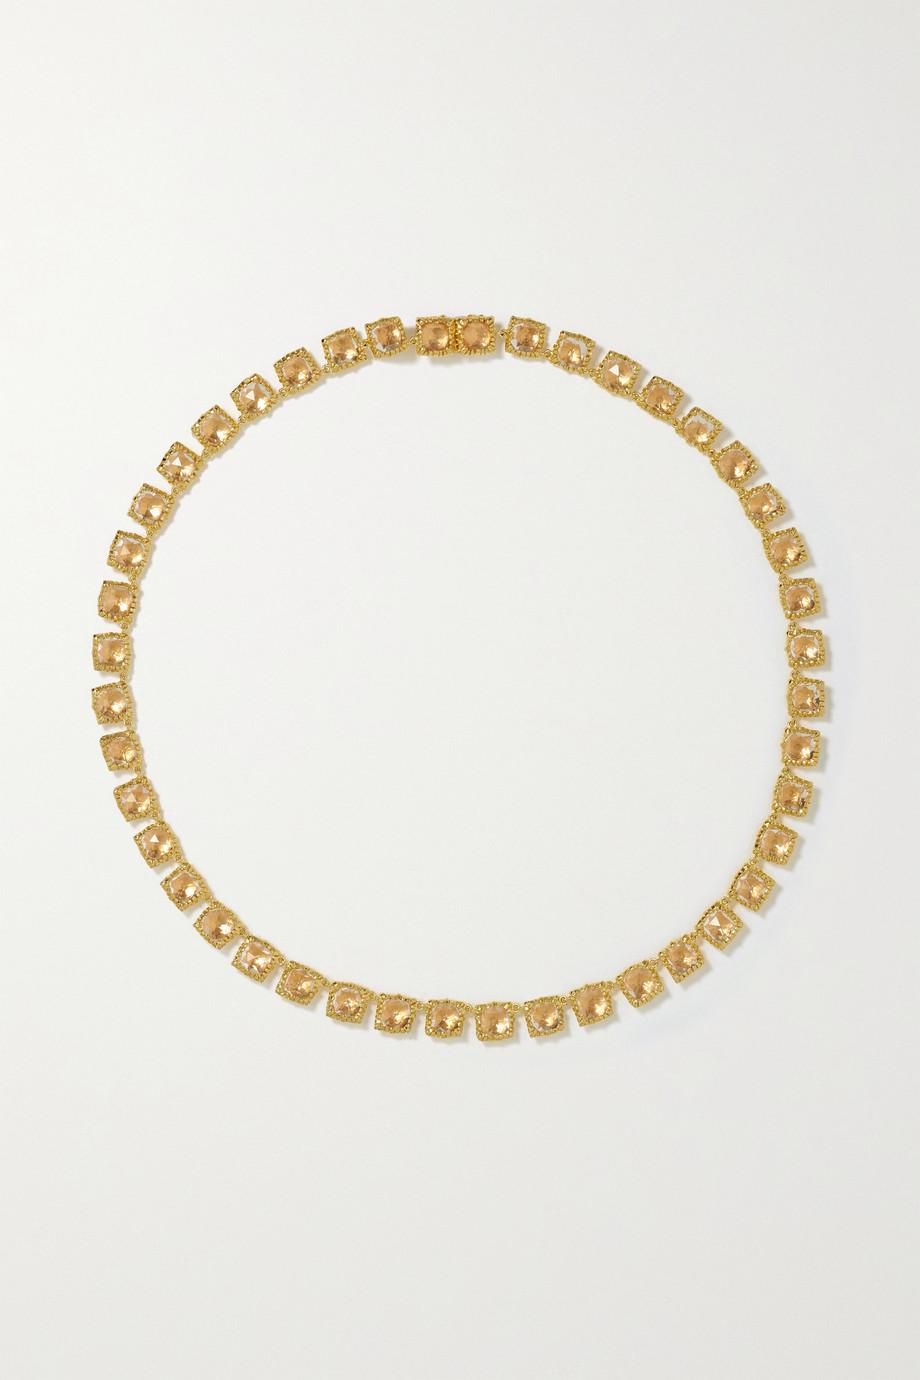 Larkspur & Hawk Bella Mini Rivière 18-karat gold-dipped quartz necklace